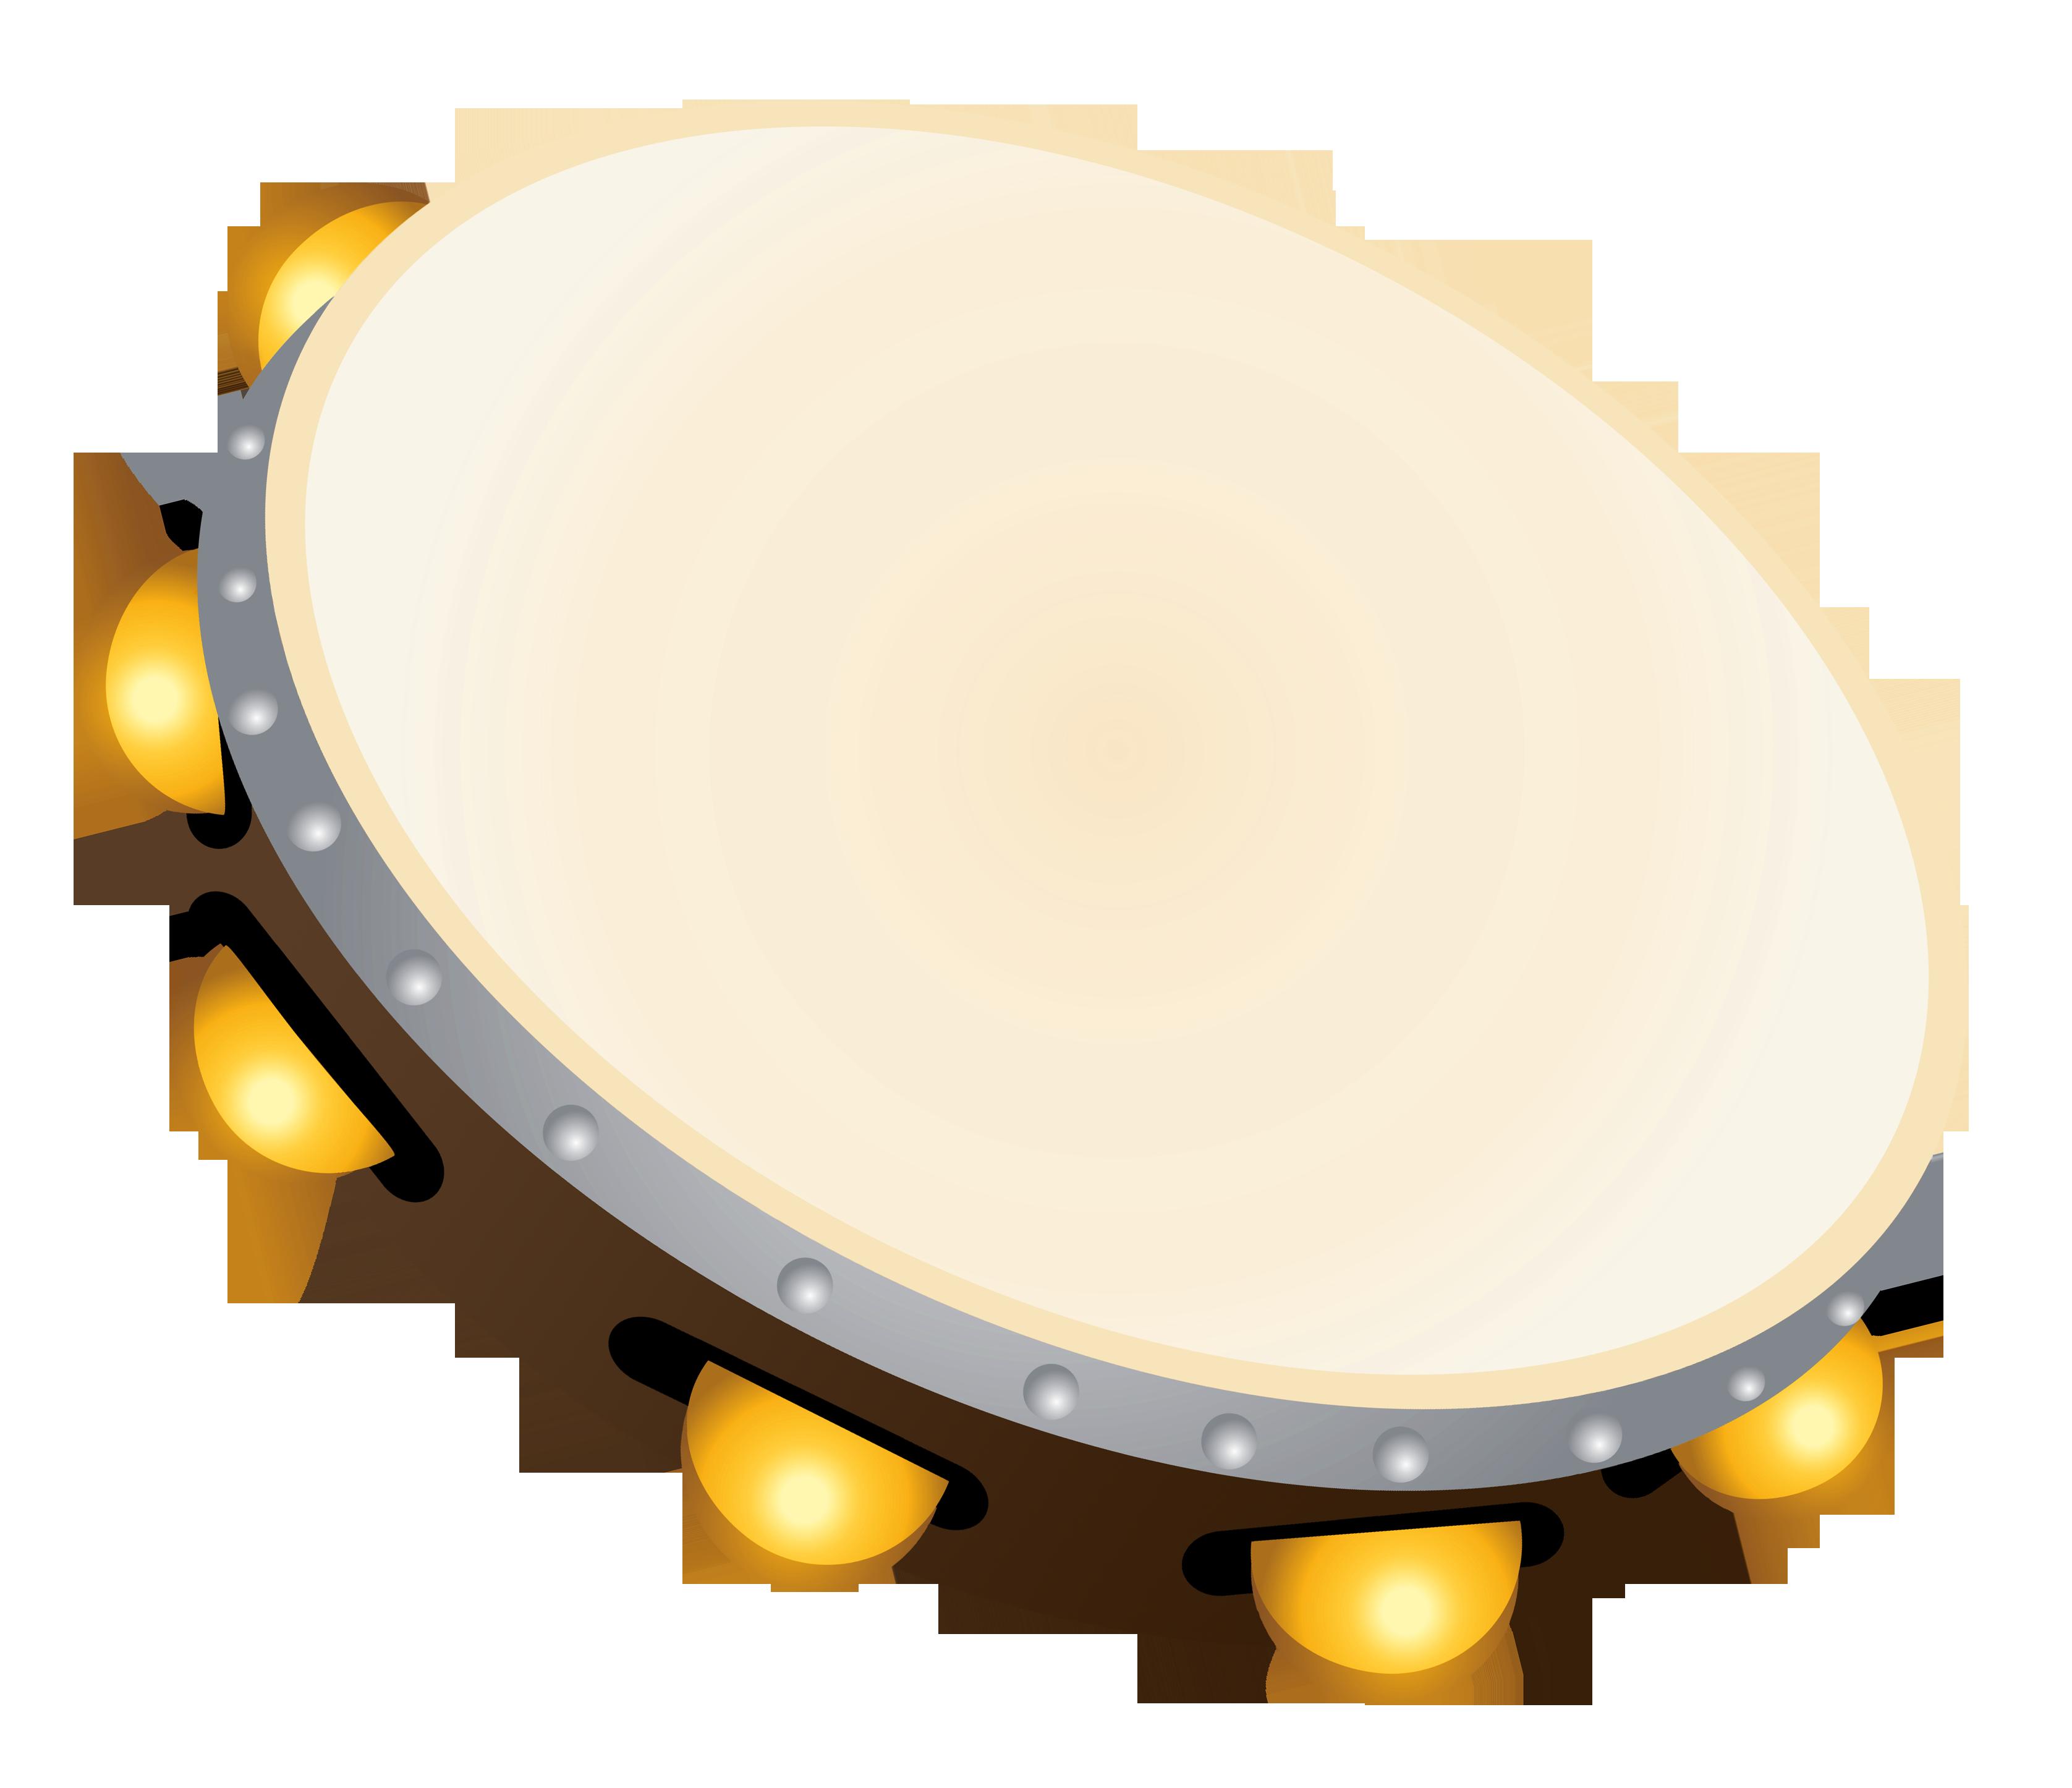 Transparent Tambourine PNG Clipart.